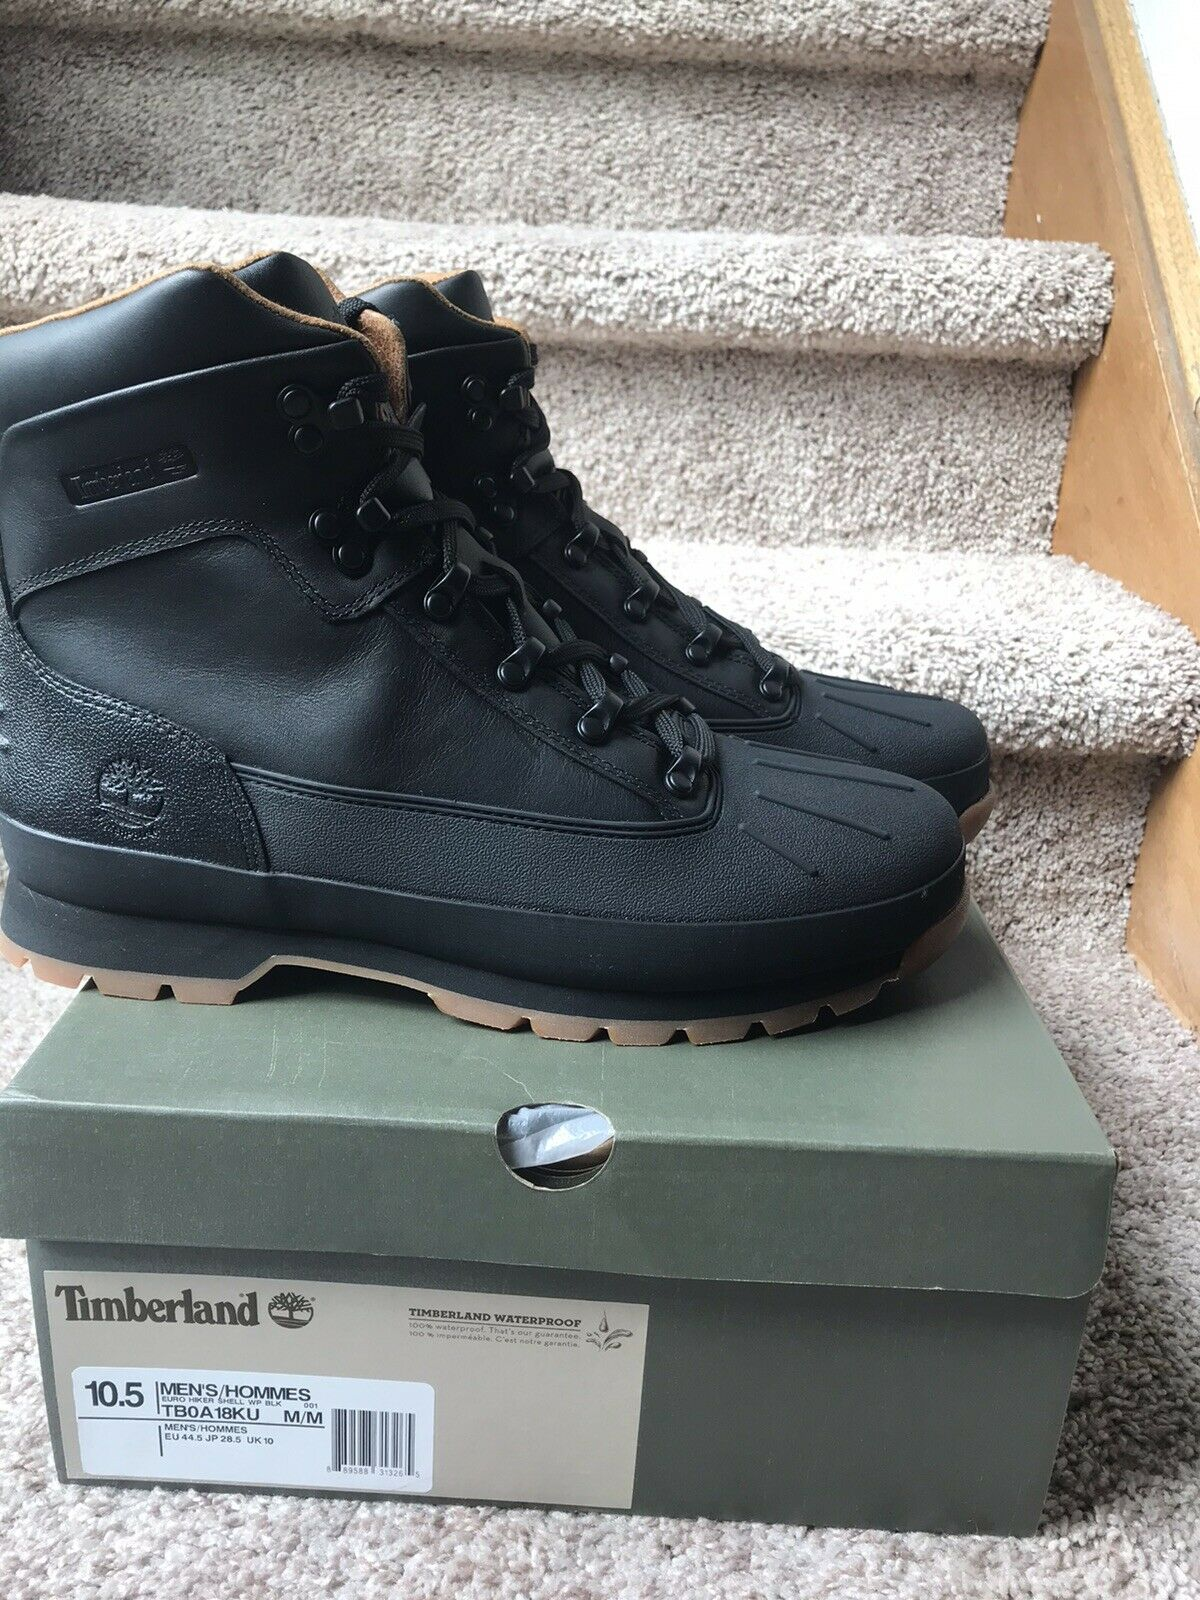 Timberland Euro Hiker Shell-toe Boots